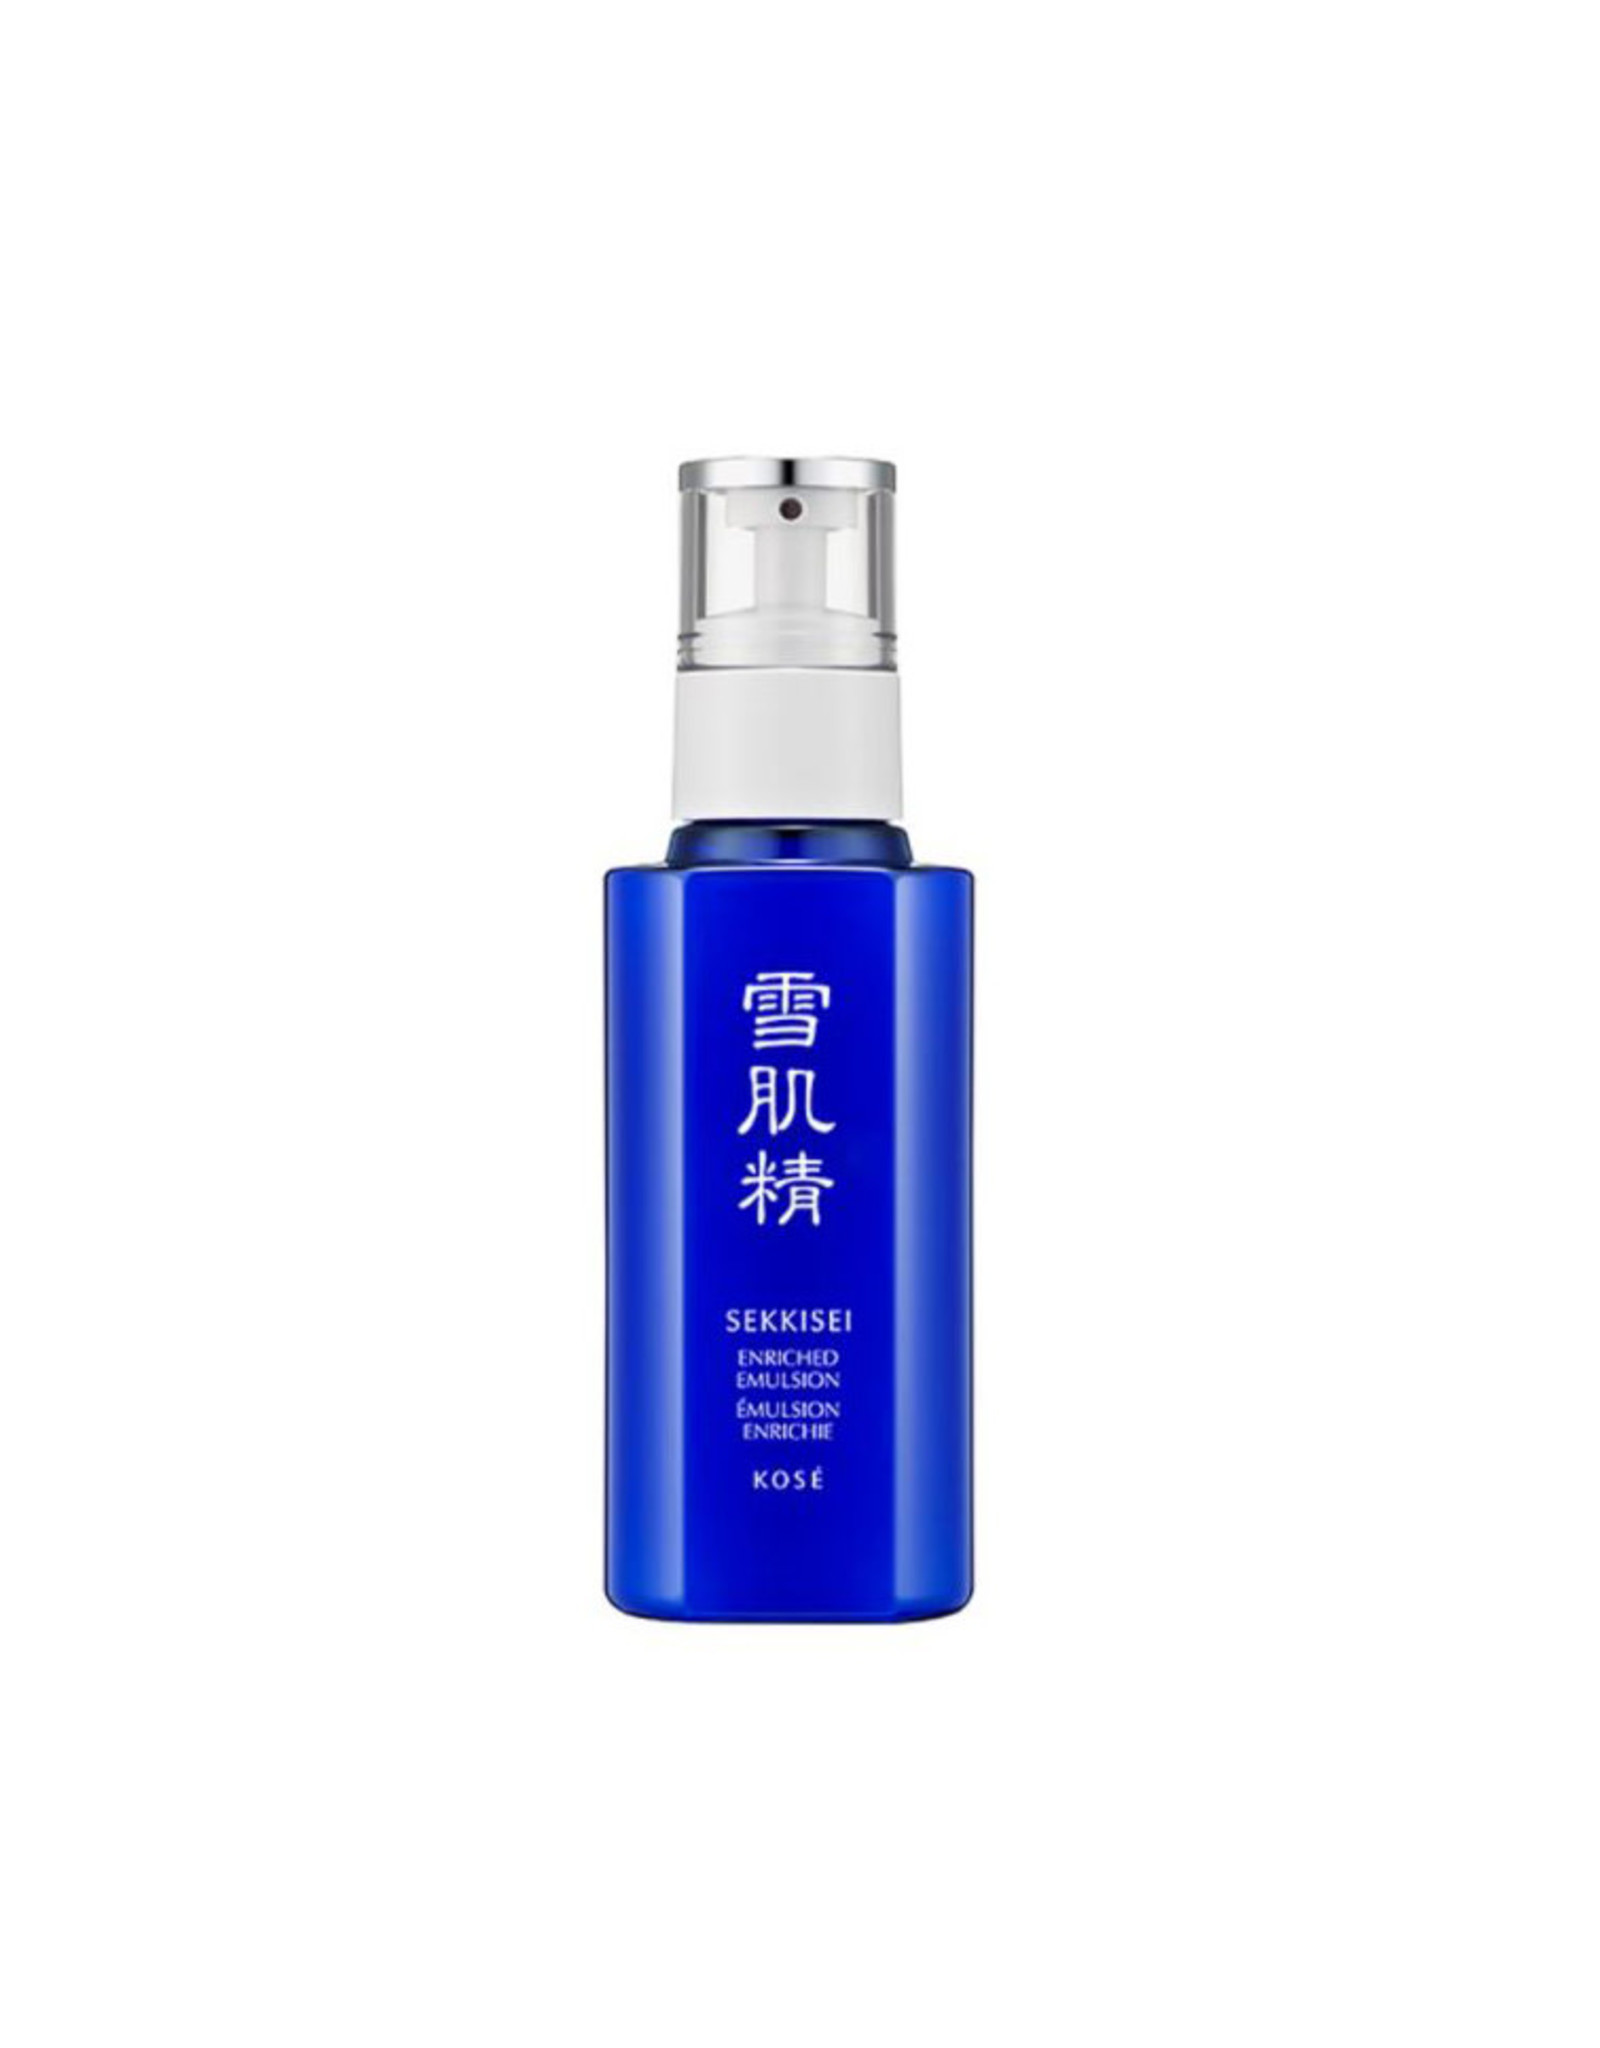 Kose Kose Sekkisei Emulsion Enriched 140ml New